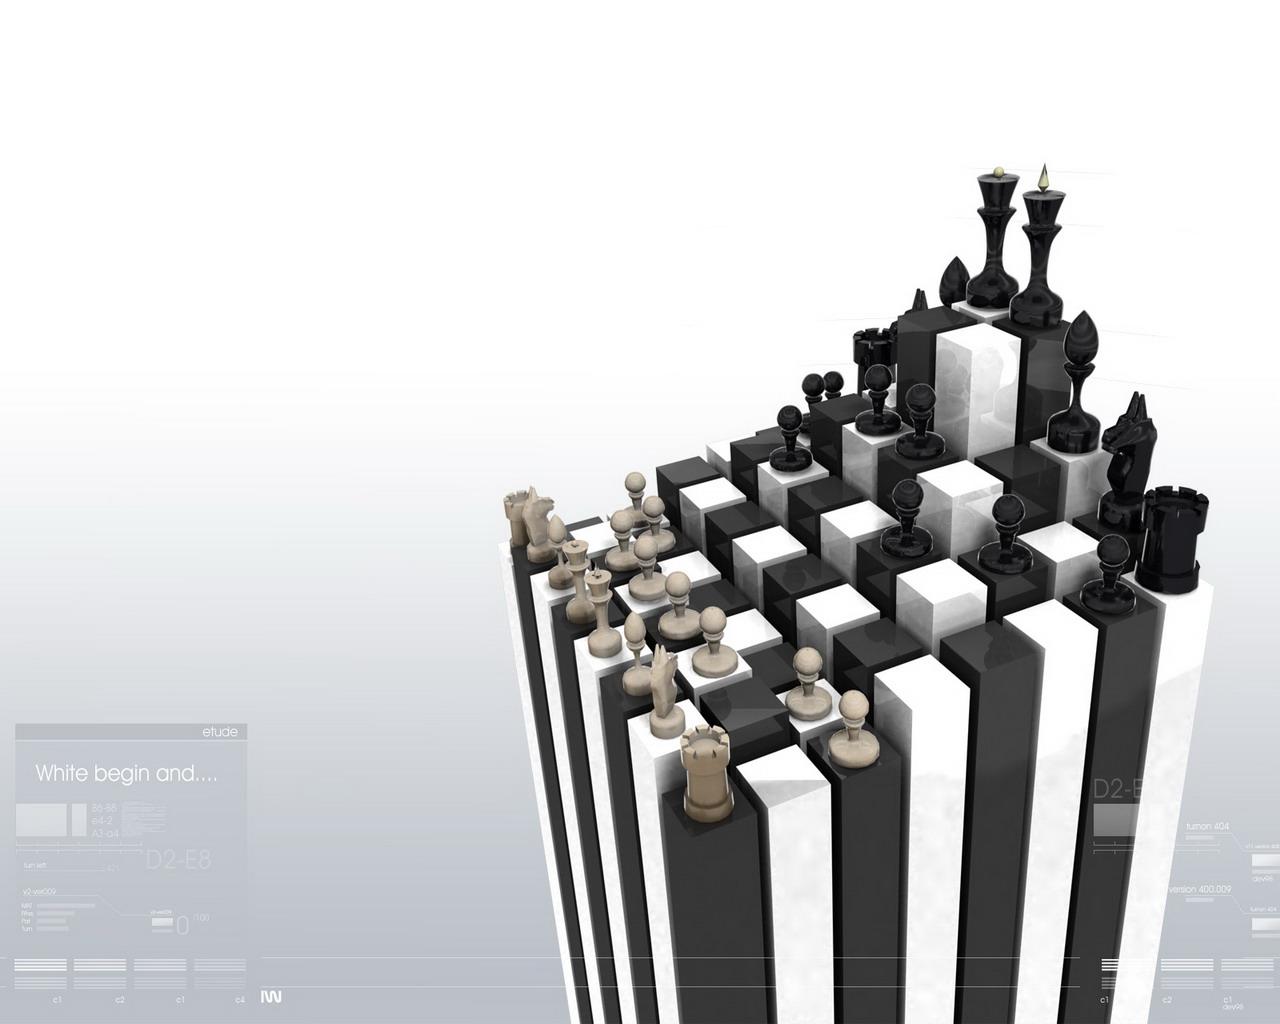 Chess 3d graphics photos chess 3d graphics voltagebd Images